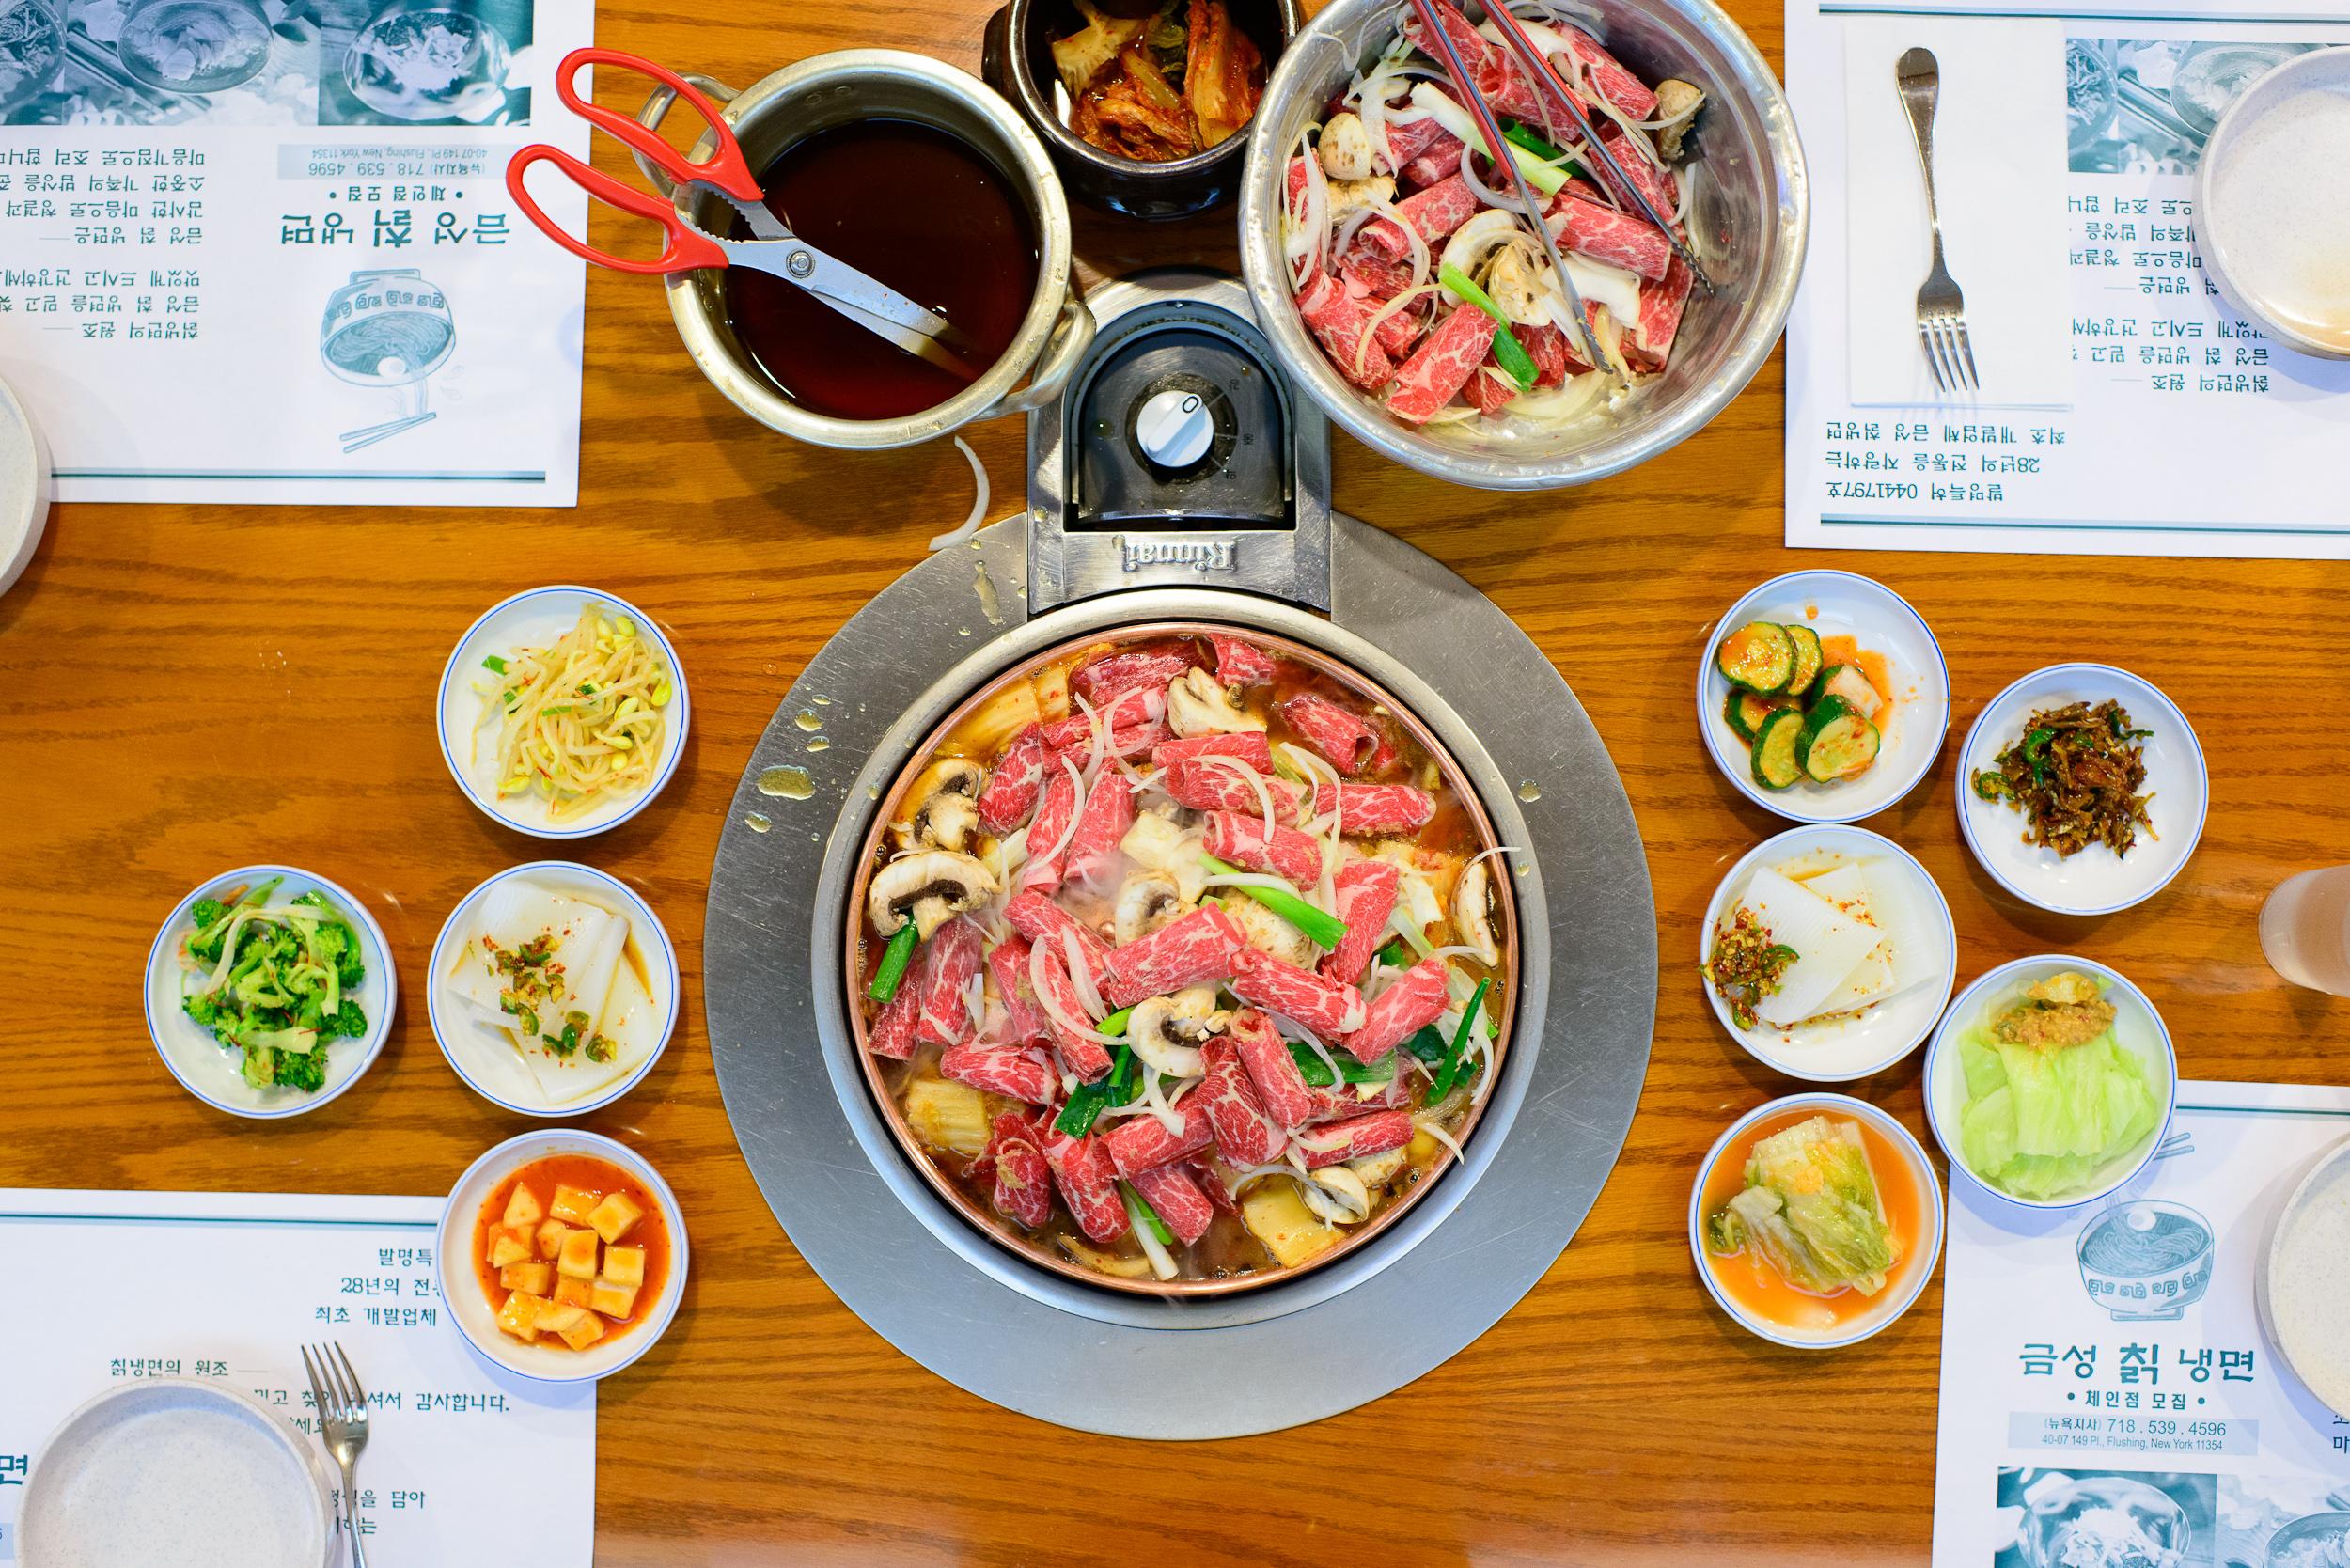 Halabuhji kimchi bulgogi - thinly sliced boneless rib eye steak